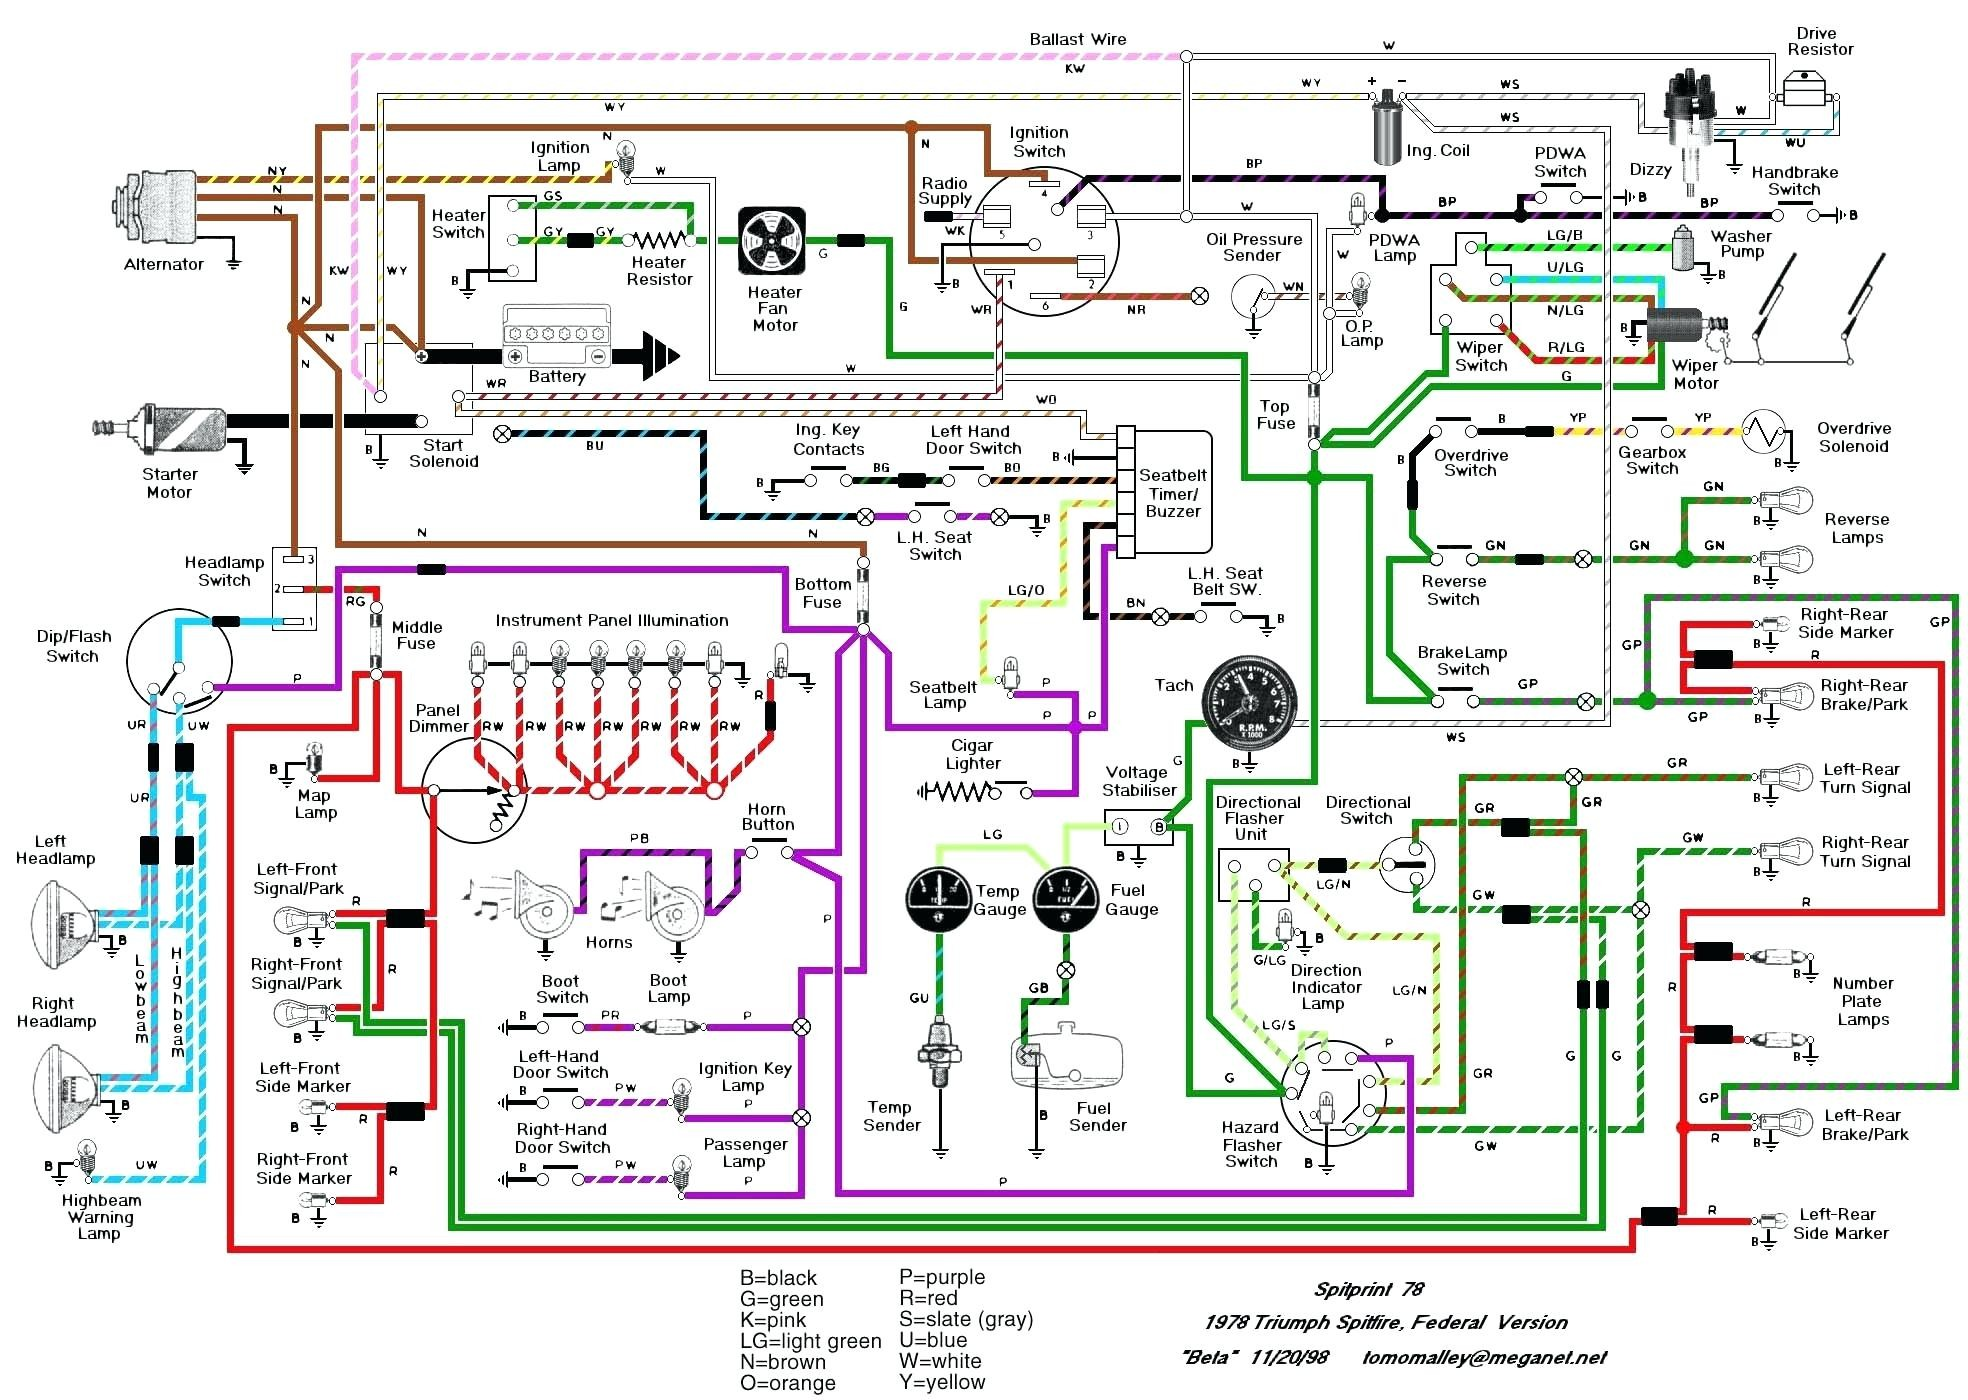 Car Schematic Diagram Wiring Diagram for Nest thermostat Diagrams Net Dodge Dart Car Of Car Schematic Diagram